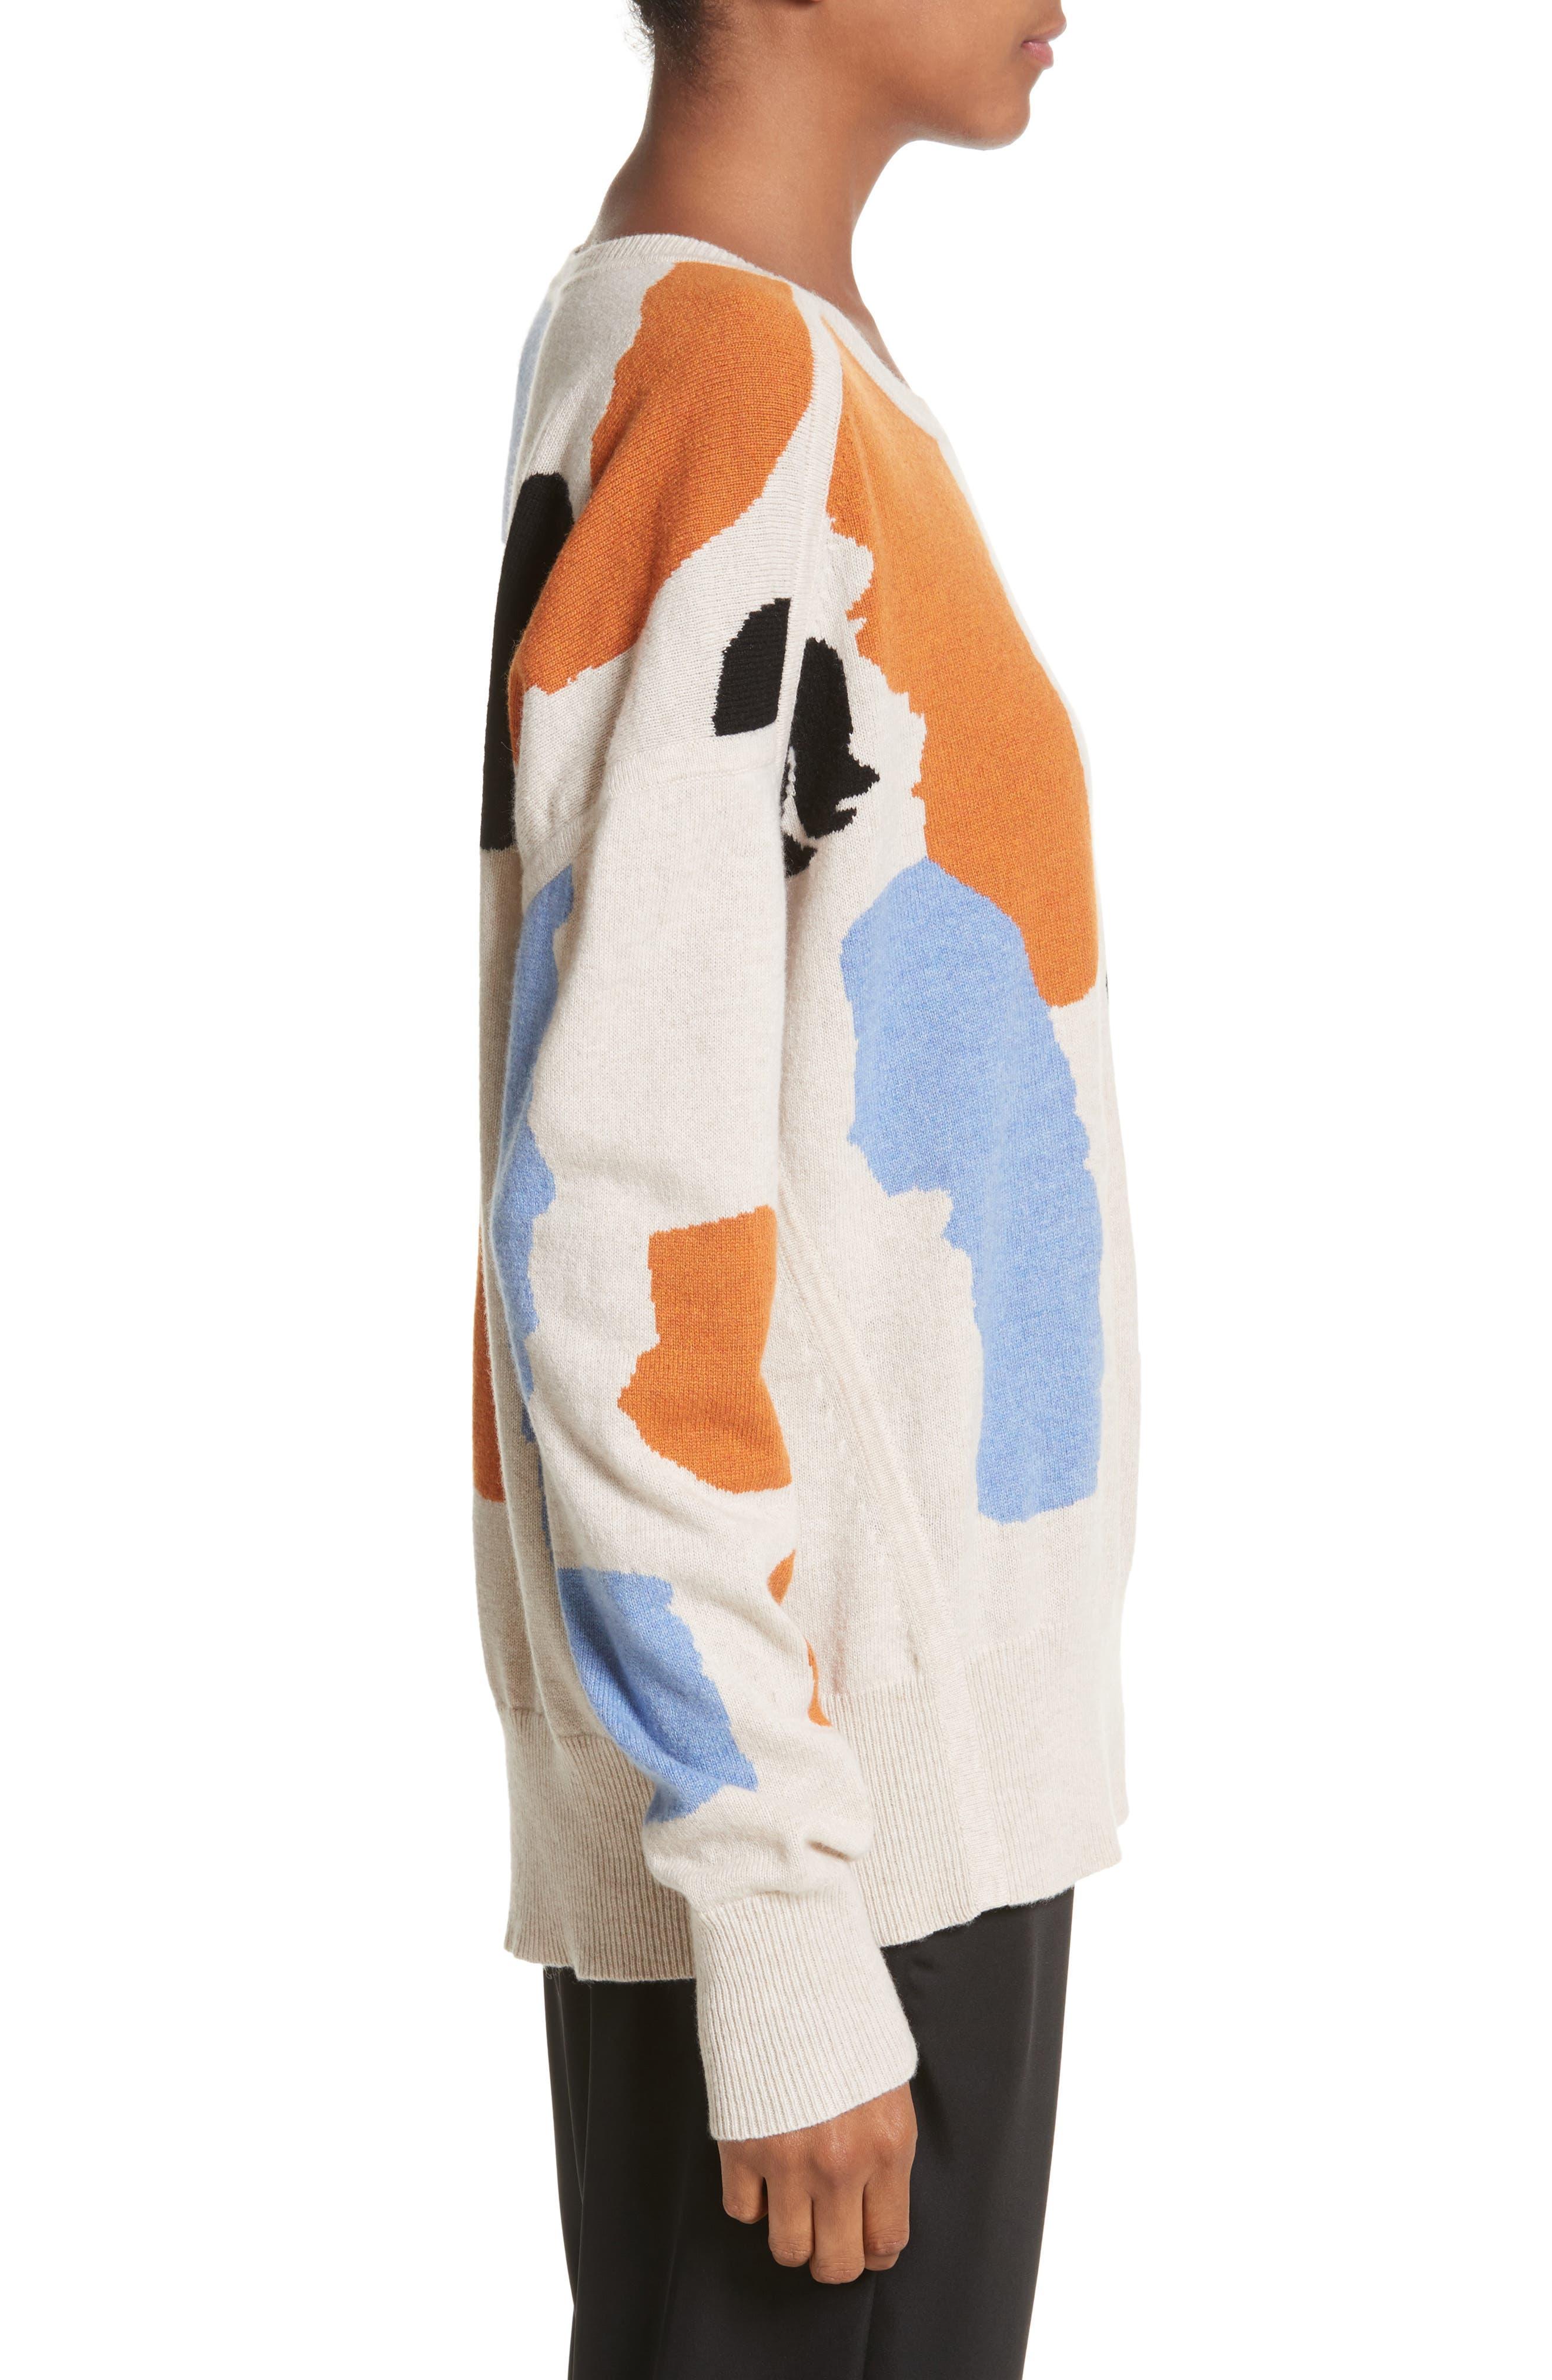 ZERO + MARIA CORNEJO,                             Palette Cashmere & Merino Wool Sweater,                             Alternate thumbnail 3, color,                             902